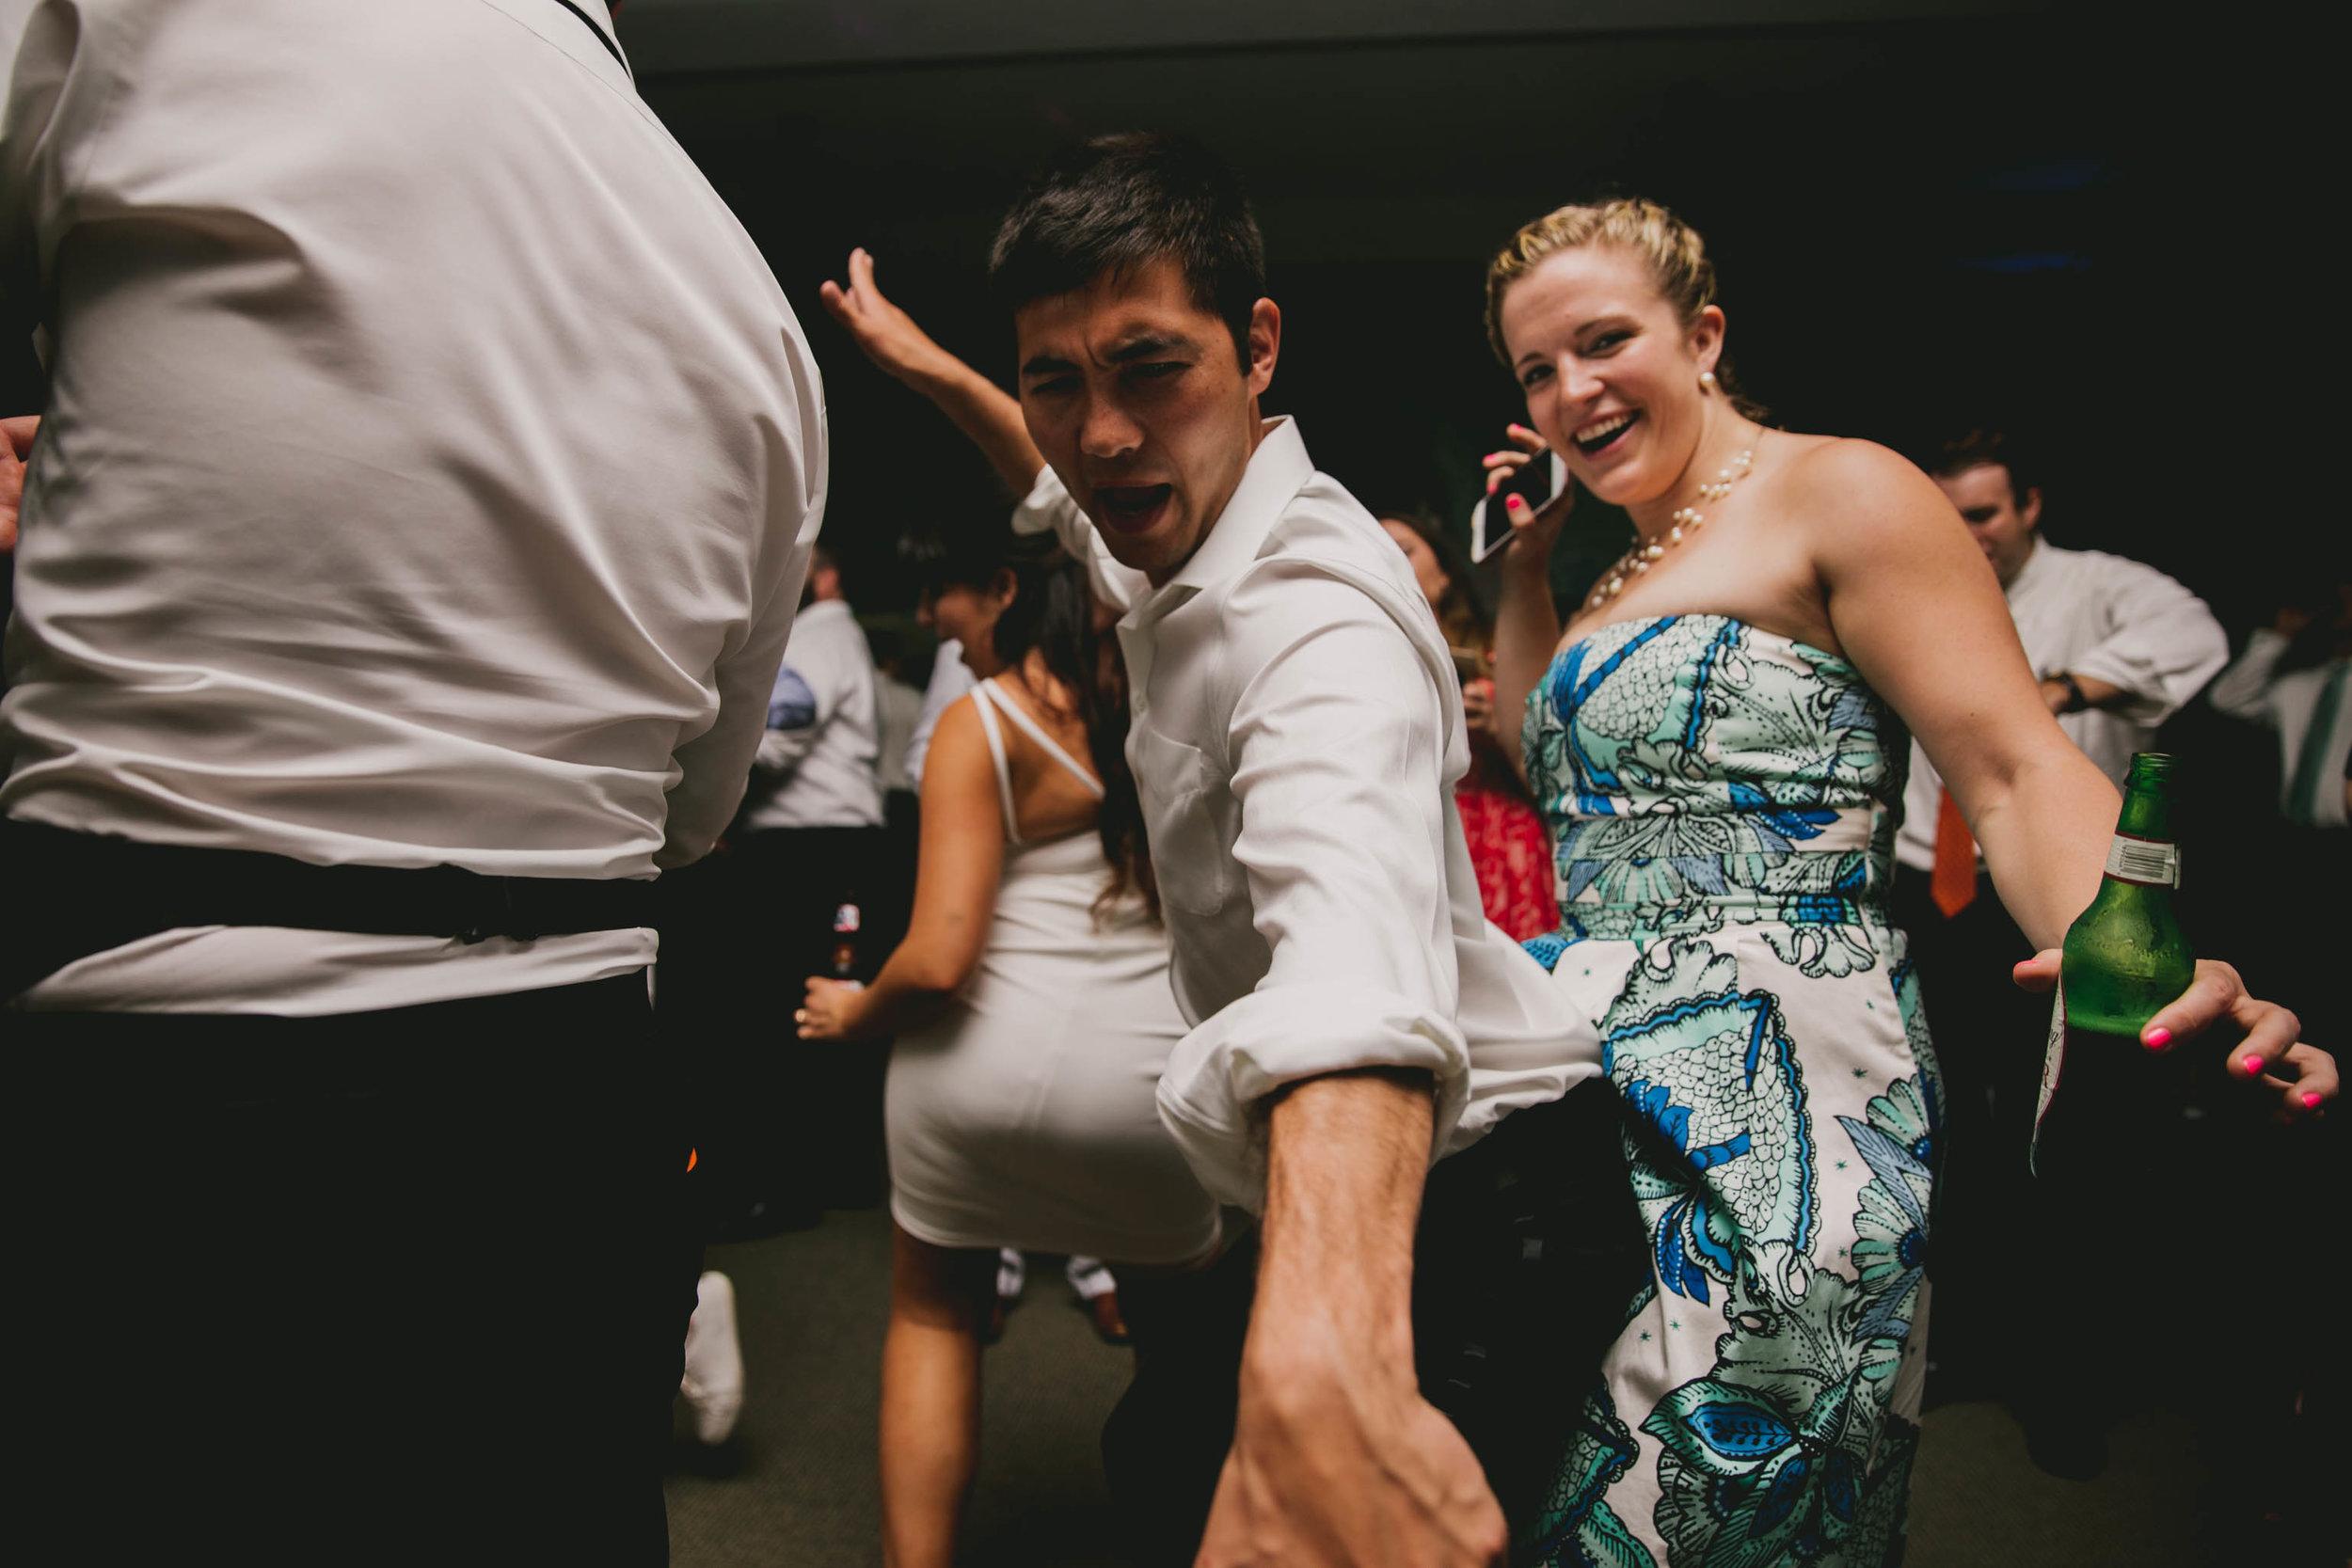 fun-wedding-reception-photo-at-the-graylyn.jpg